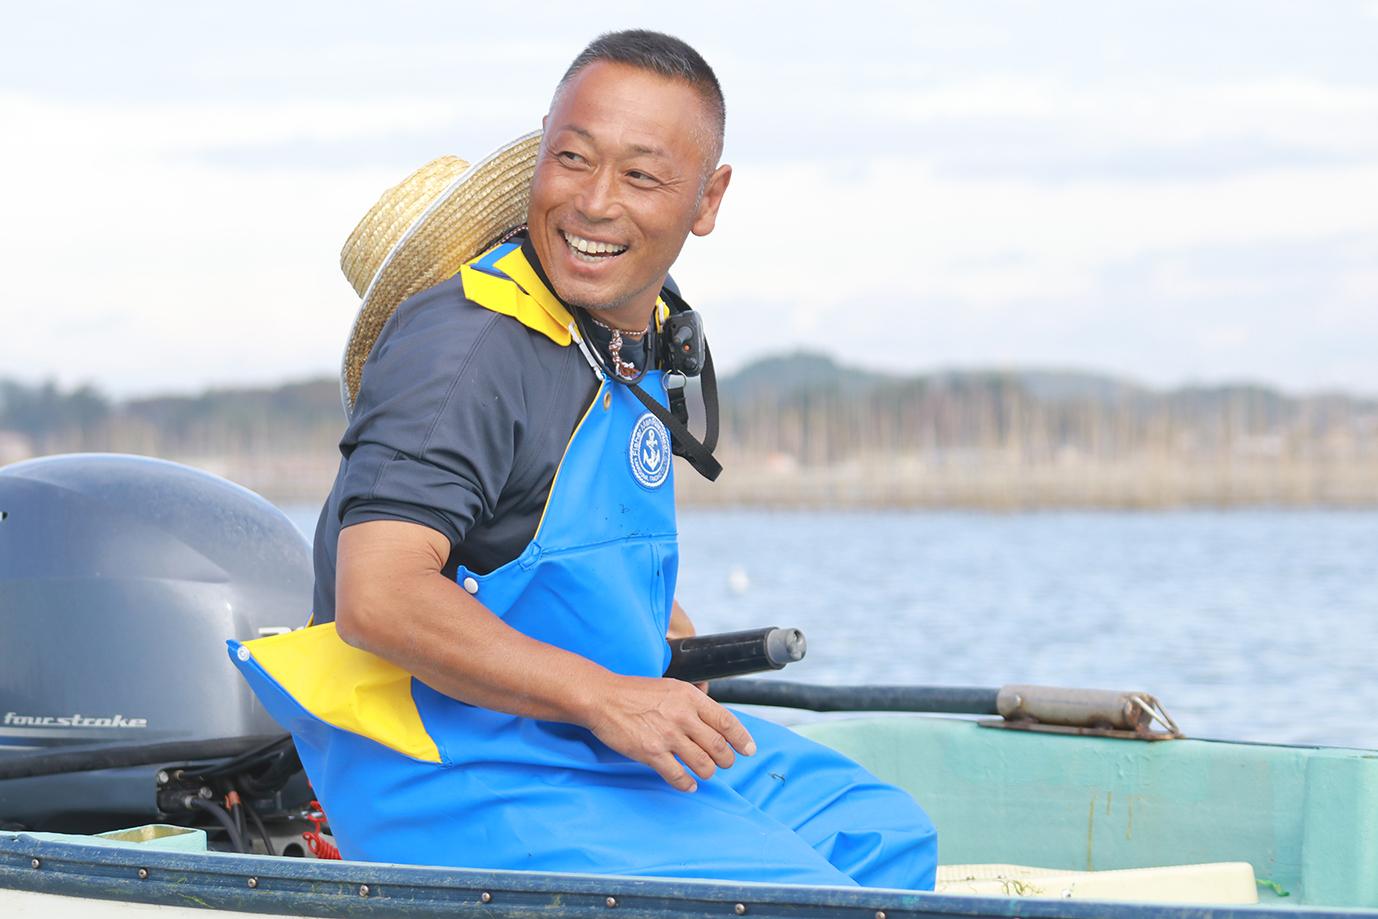 【石巻湾/海苔養殖】凡事徹底!漁師道を歩む